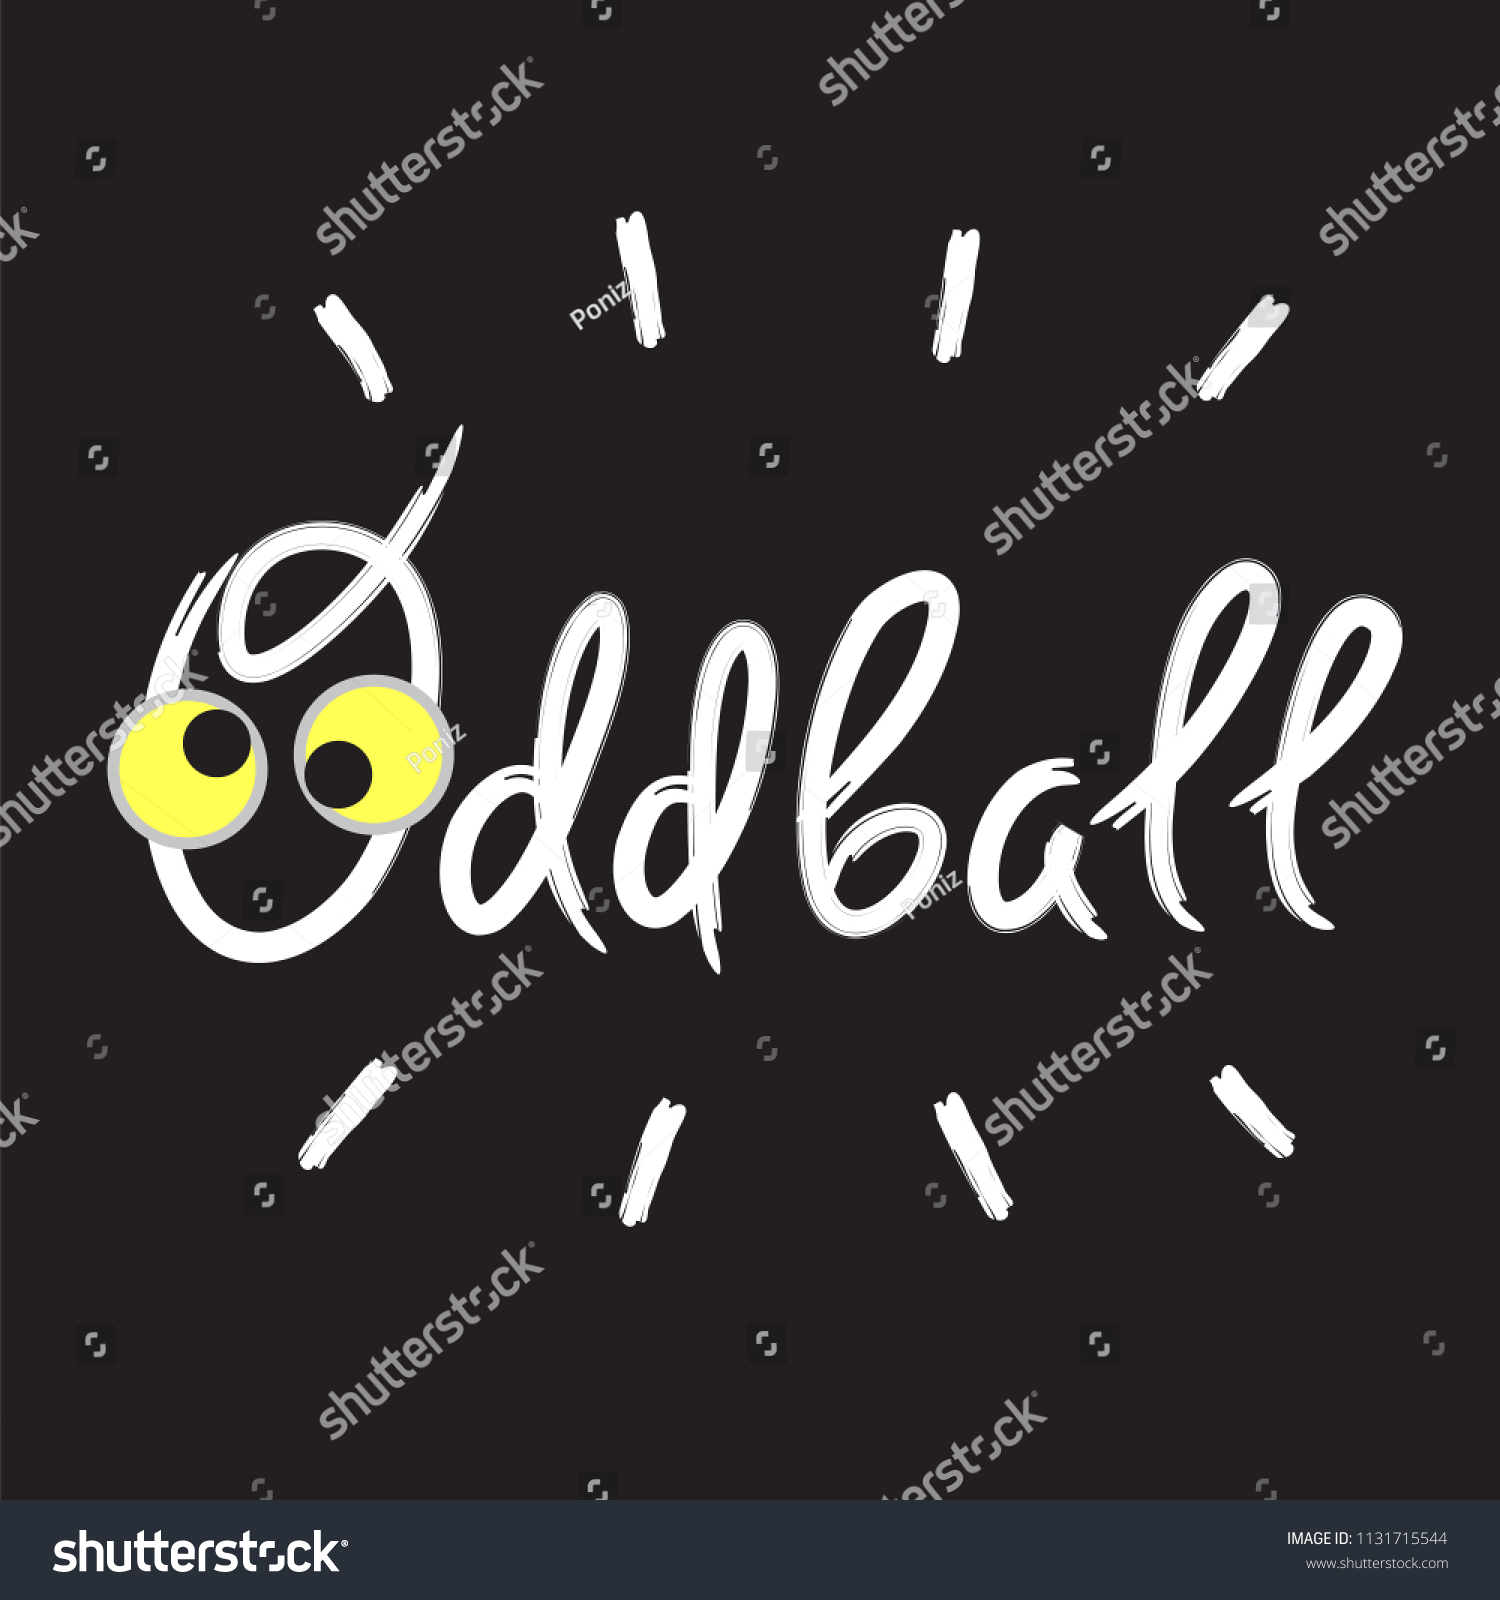 Oddball Emotional Handwritten Quote American Slang Stock Vector